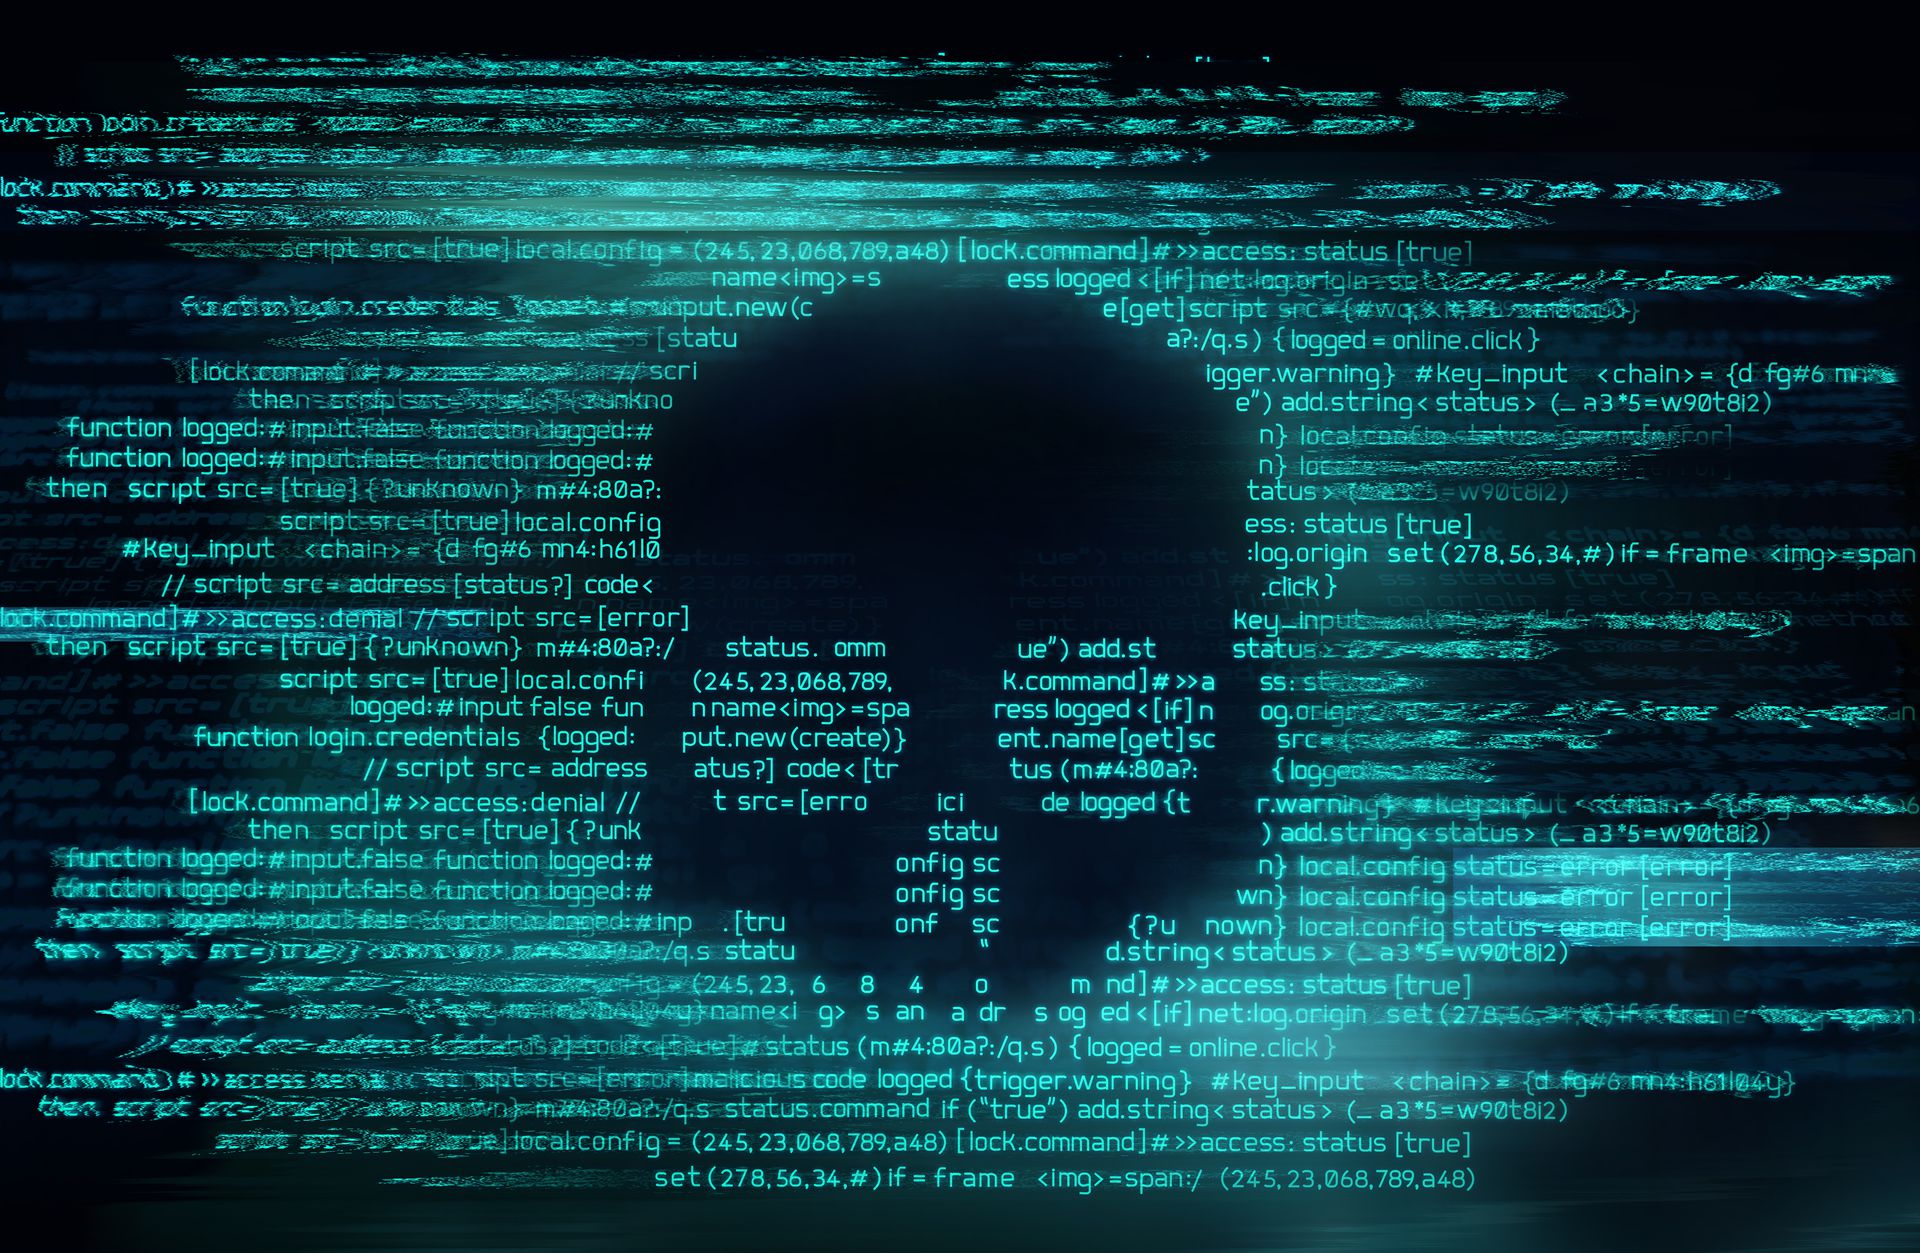 Anon-v malware